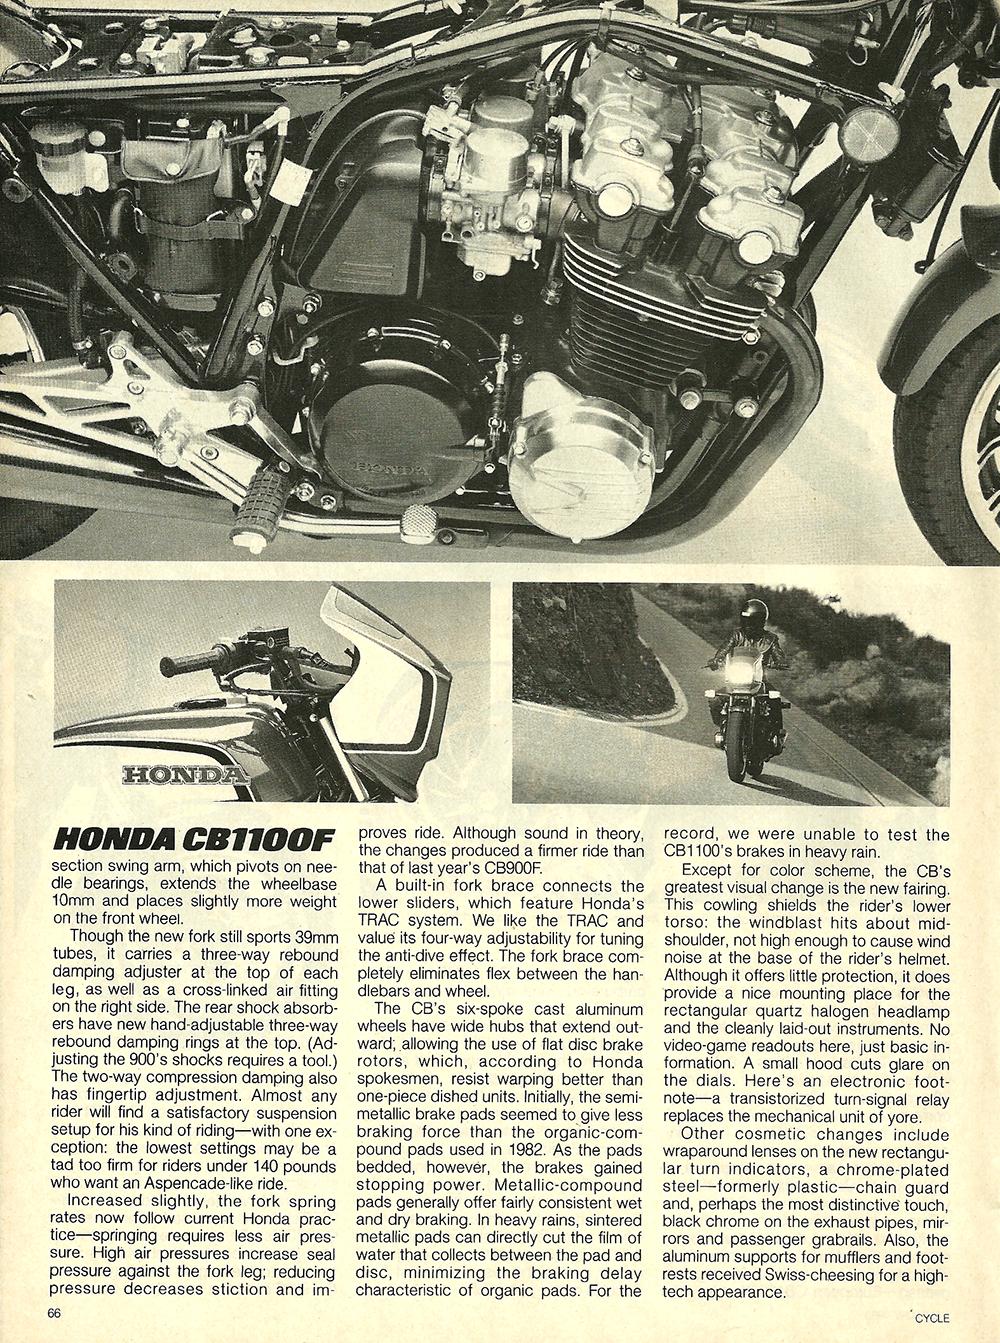 1983 Honda CB1100F road test 7.jpg